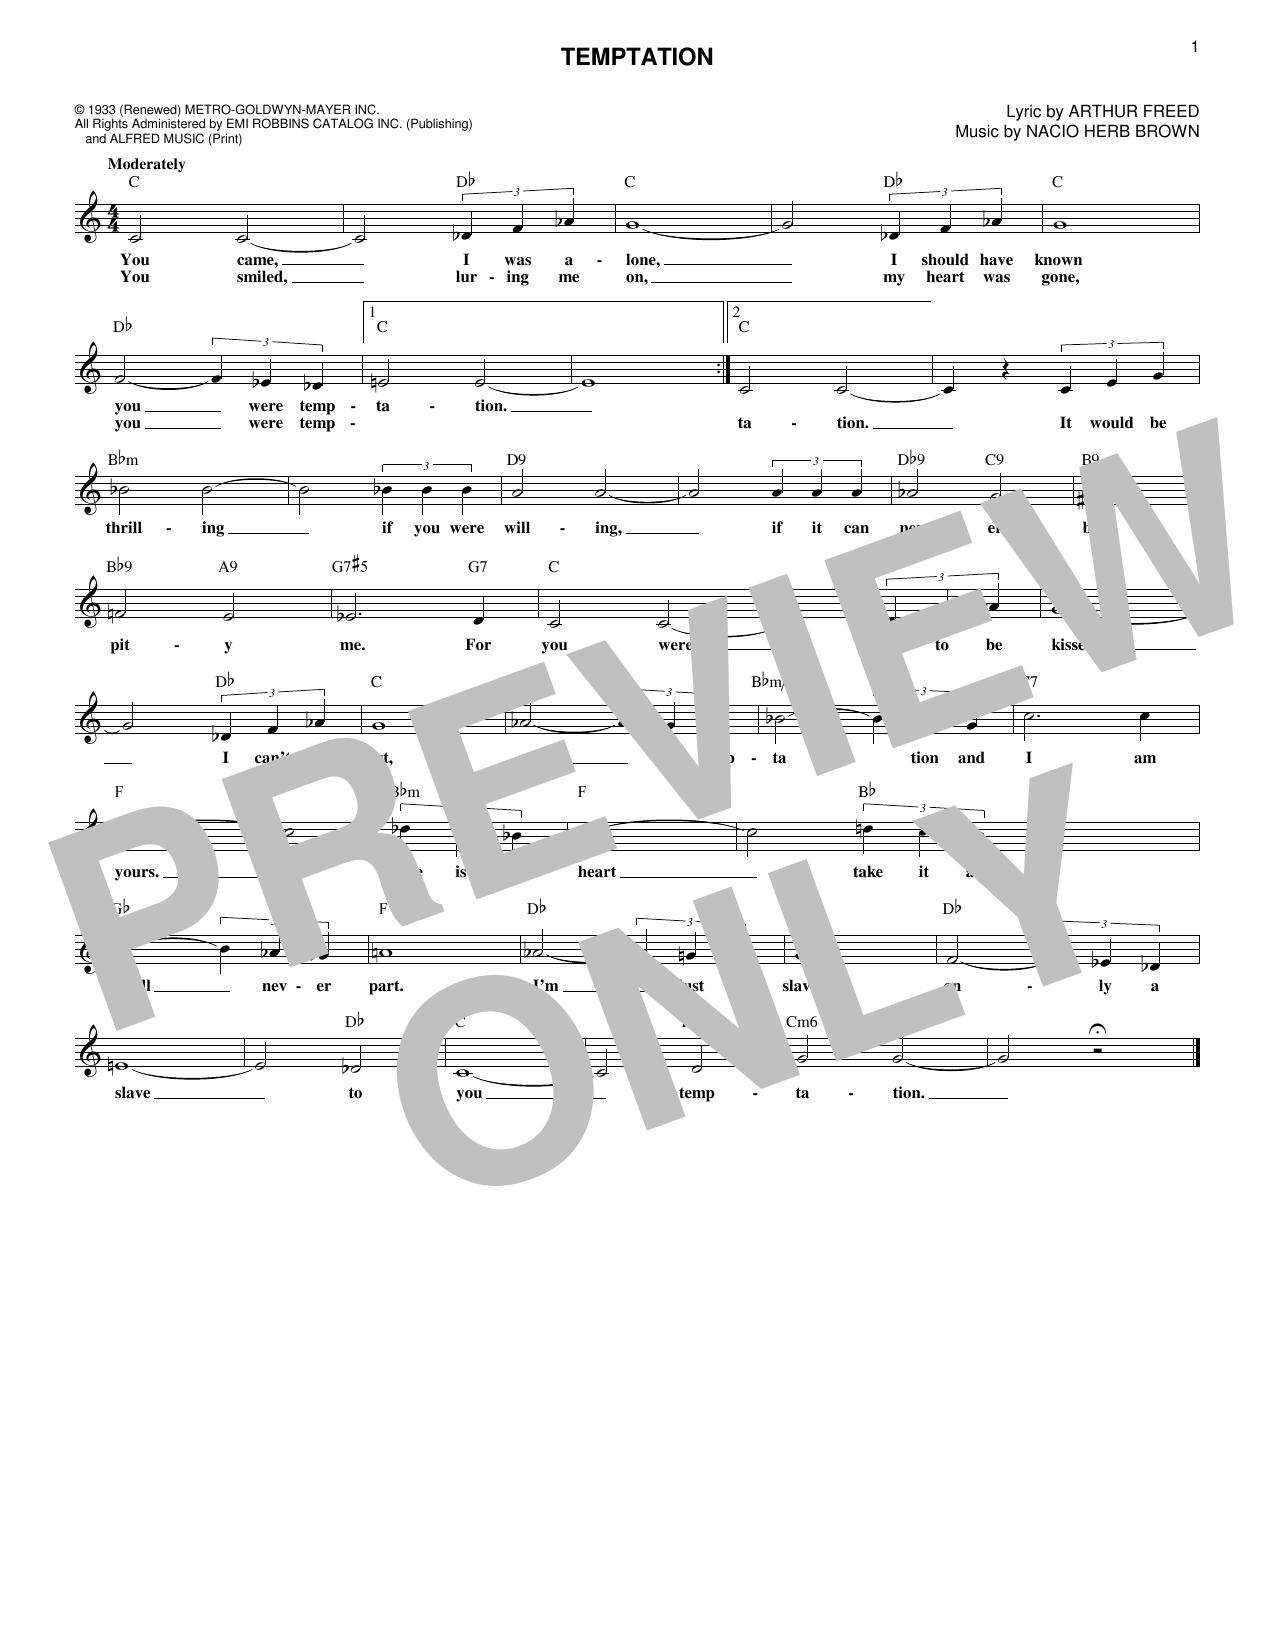 Nacio Herb Brown Temptation sheet music notes and chords. Download Printable PDF.